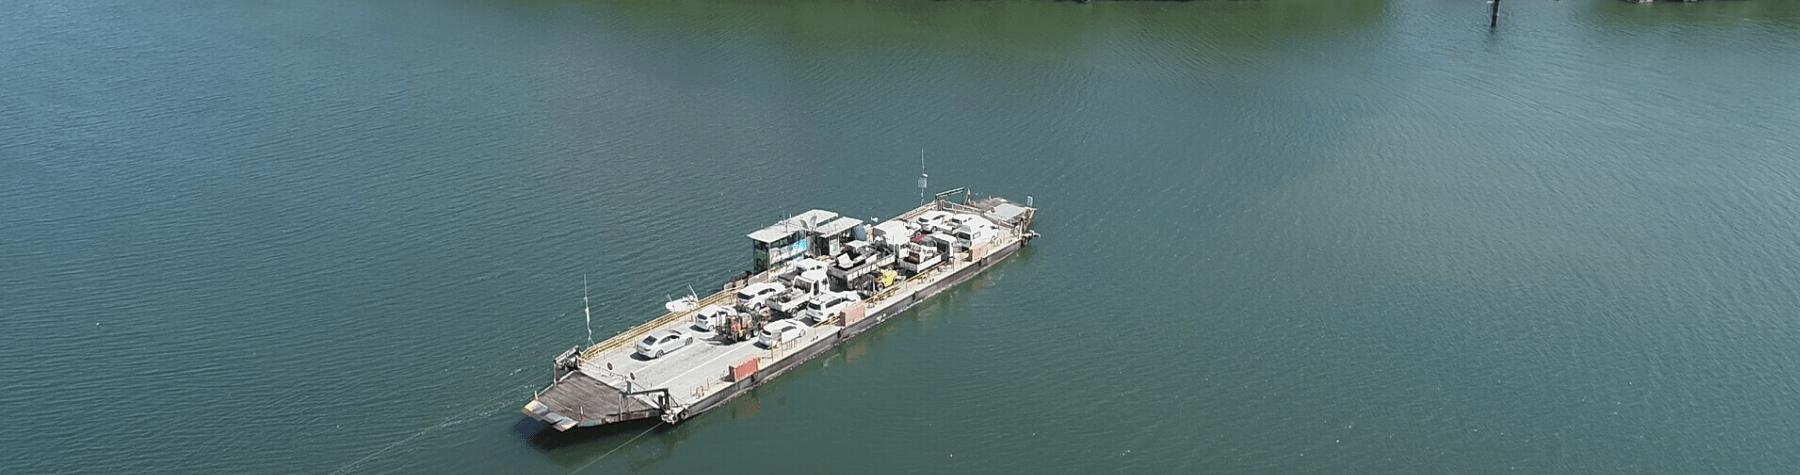 Dates announced || Daintree River Crossing community meetings